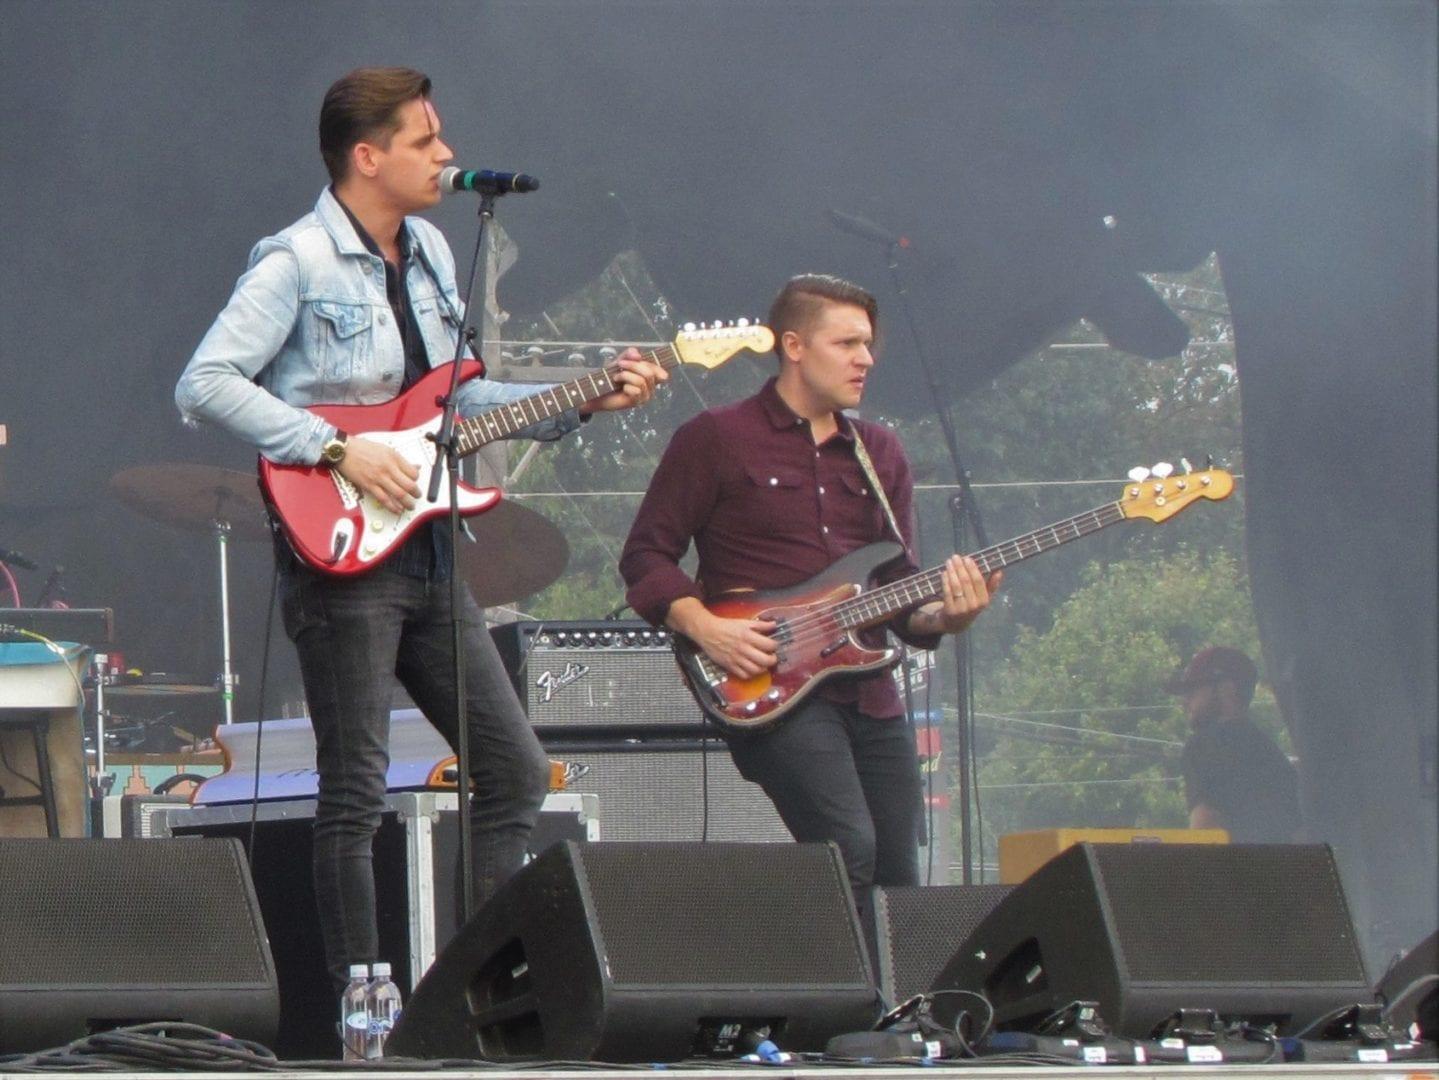 Two men holding guitars